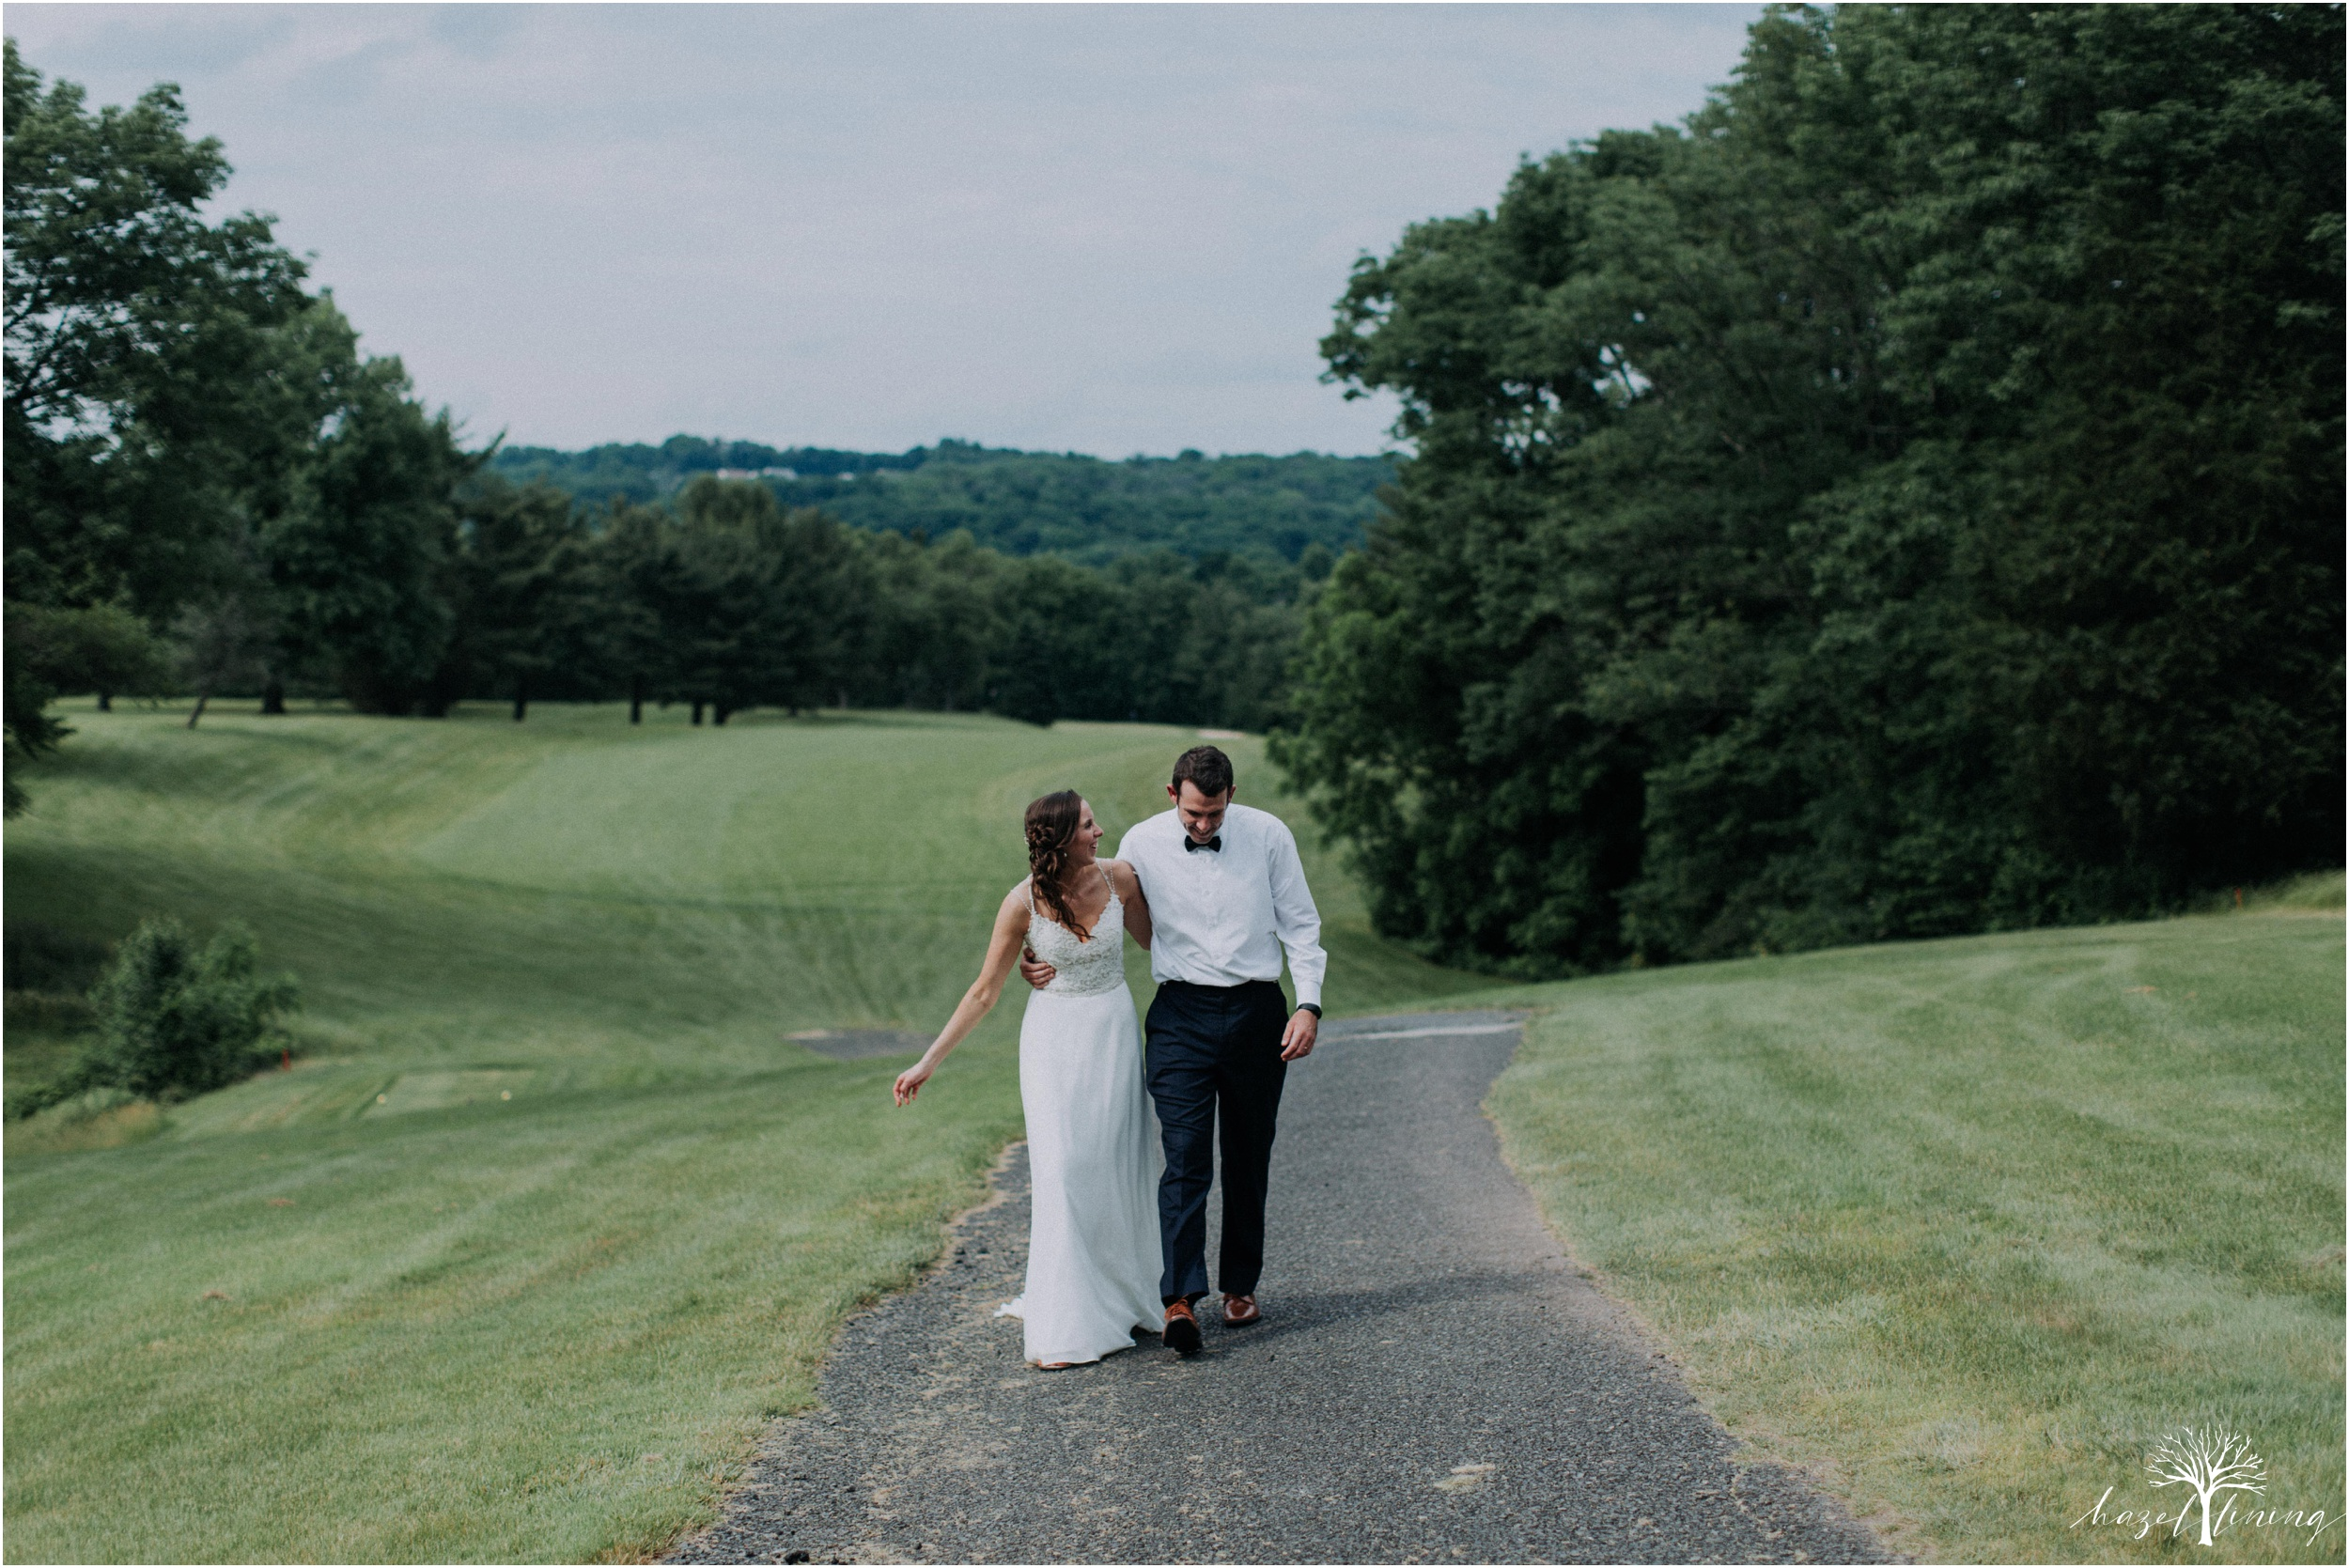 hazel-lining-travel-wedding-elopement-photography_0111.jpg